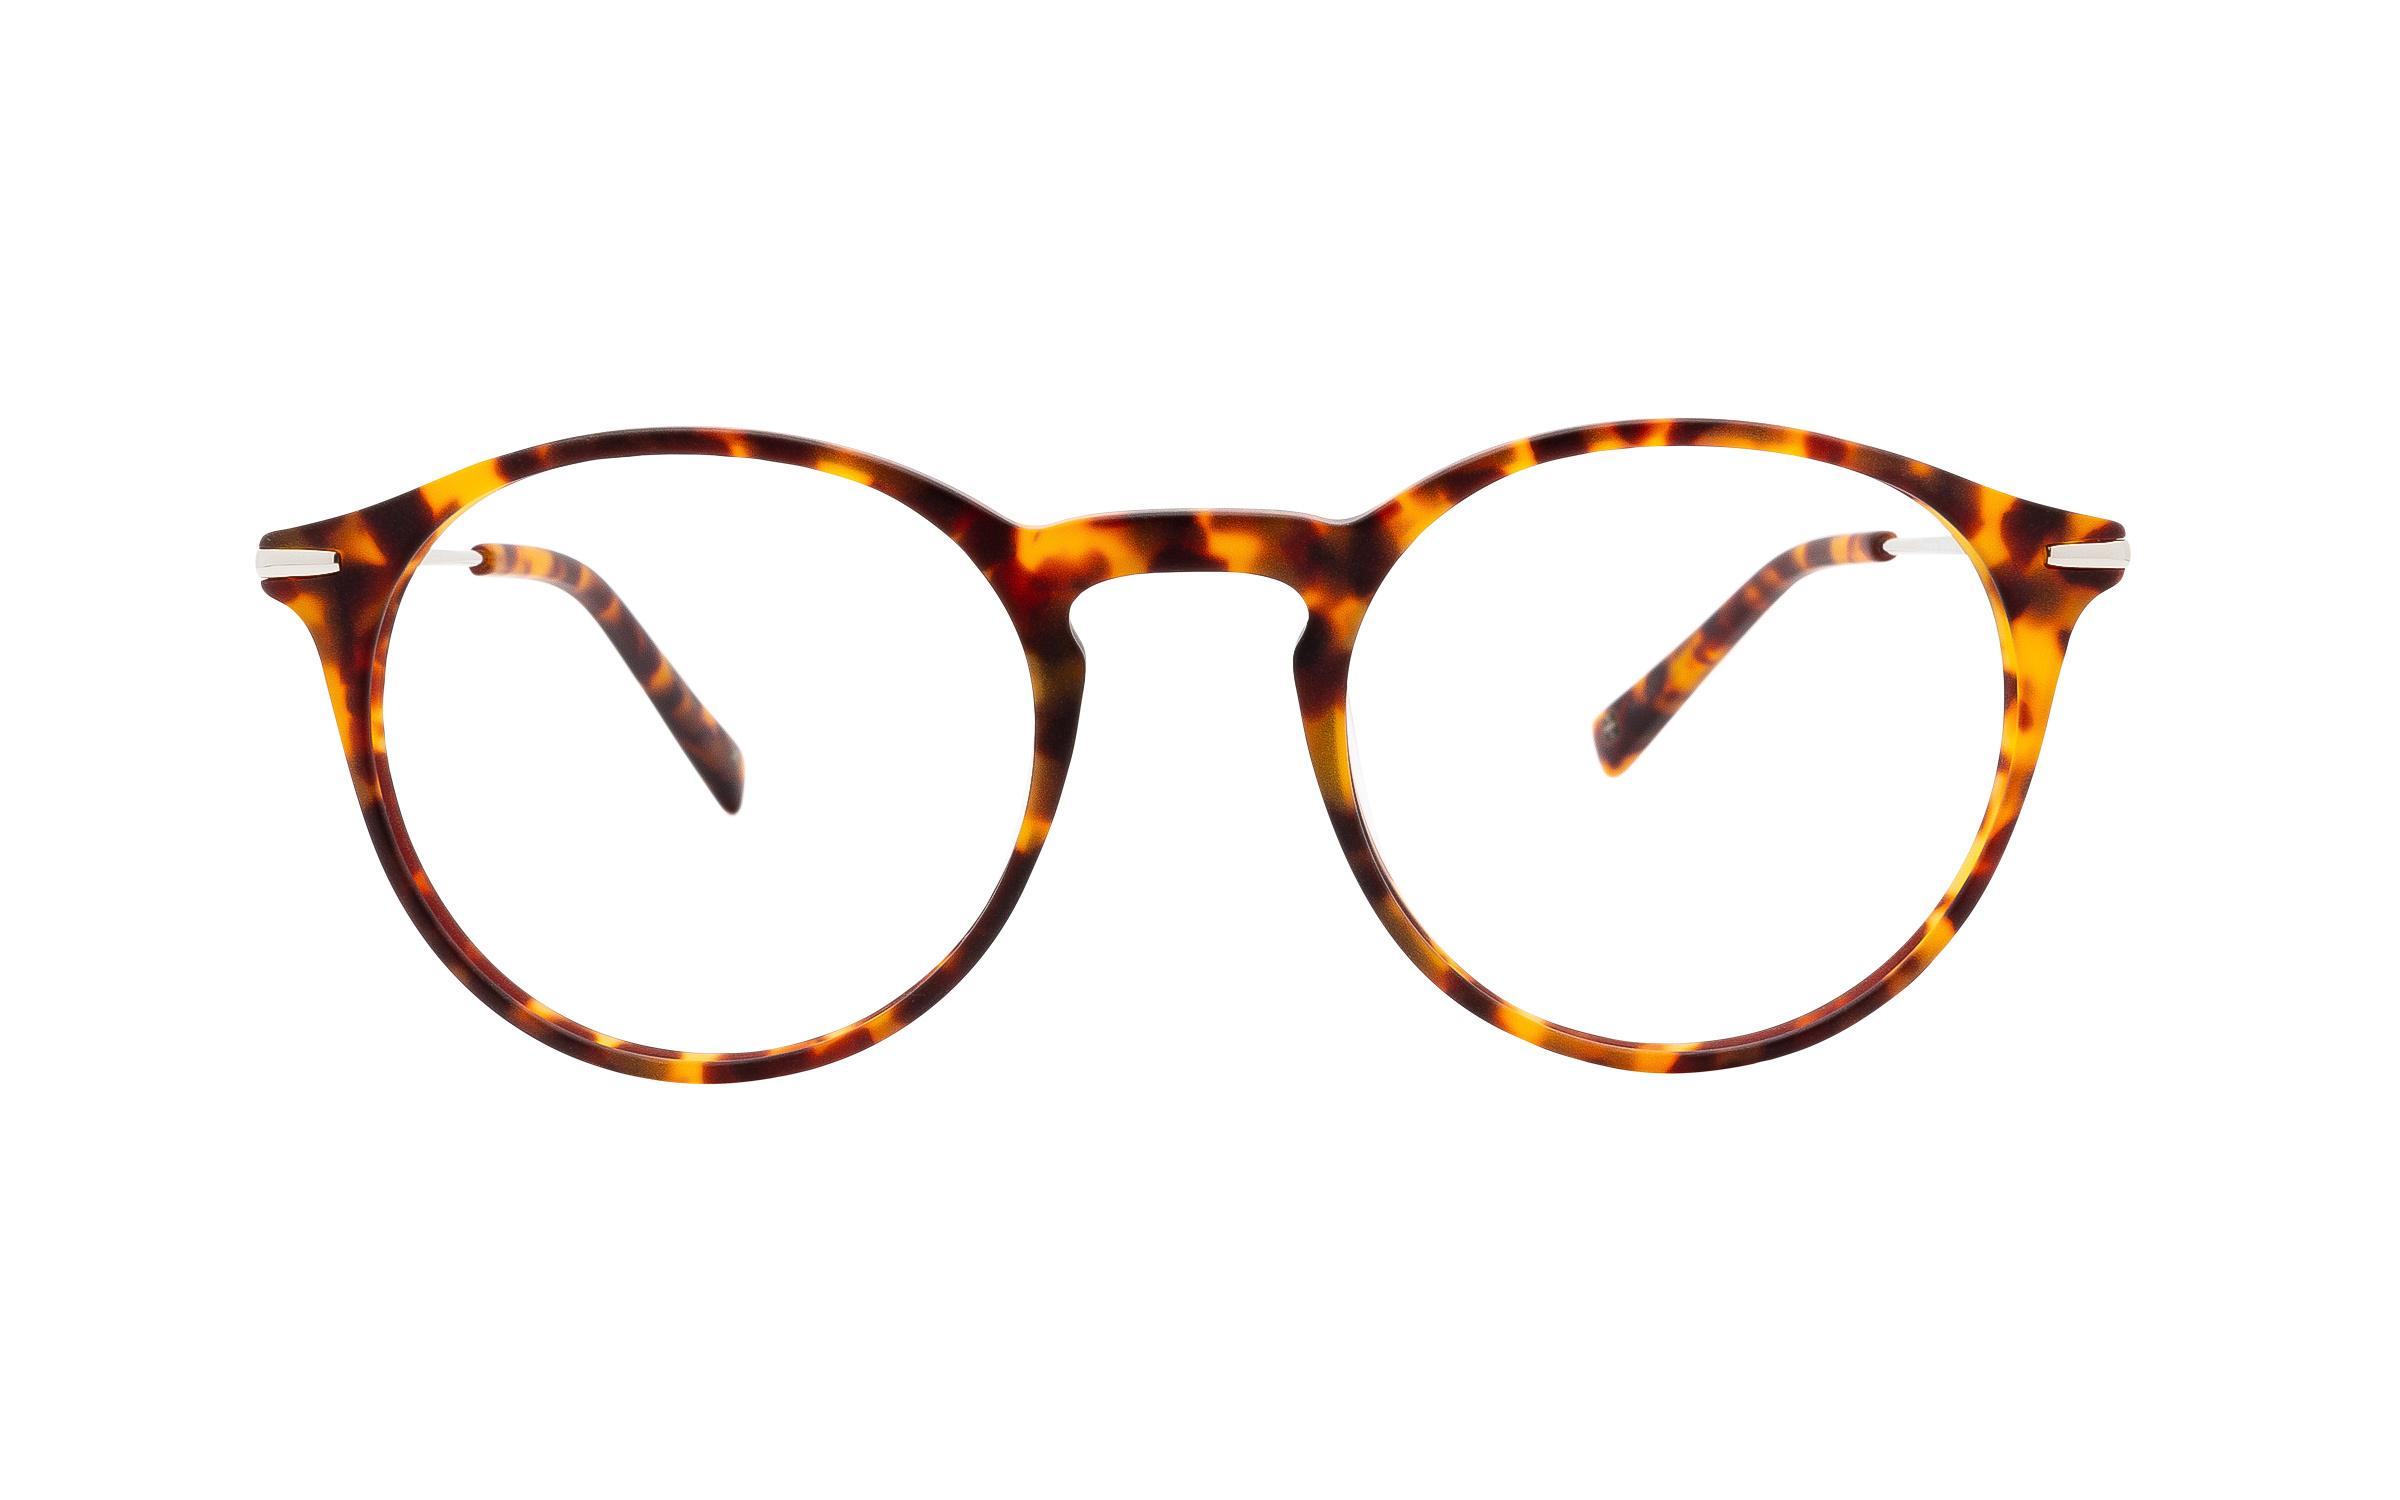 http://www.coastal.com/ - Derek Cardigan Dorado DC235 C02 (48) Eyeglasses and Frame in Matte Havana Tortoise/Brown   Acetate/Metal – Online Coastal